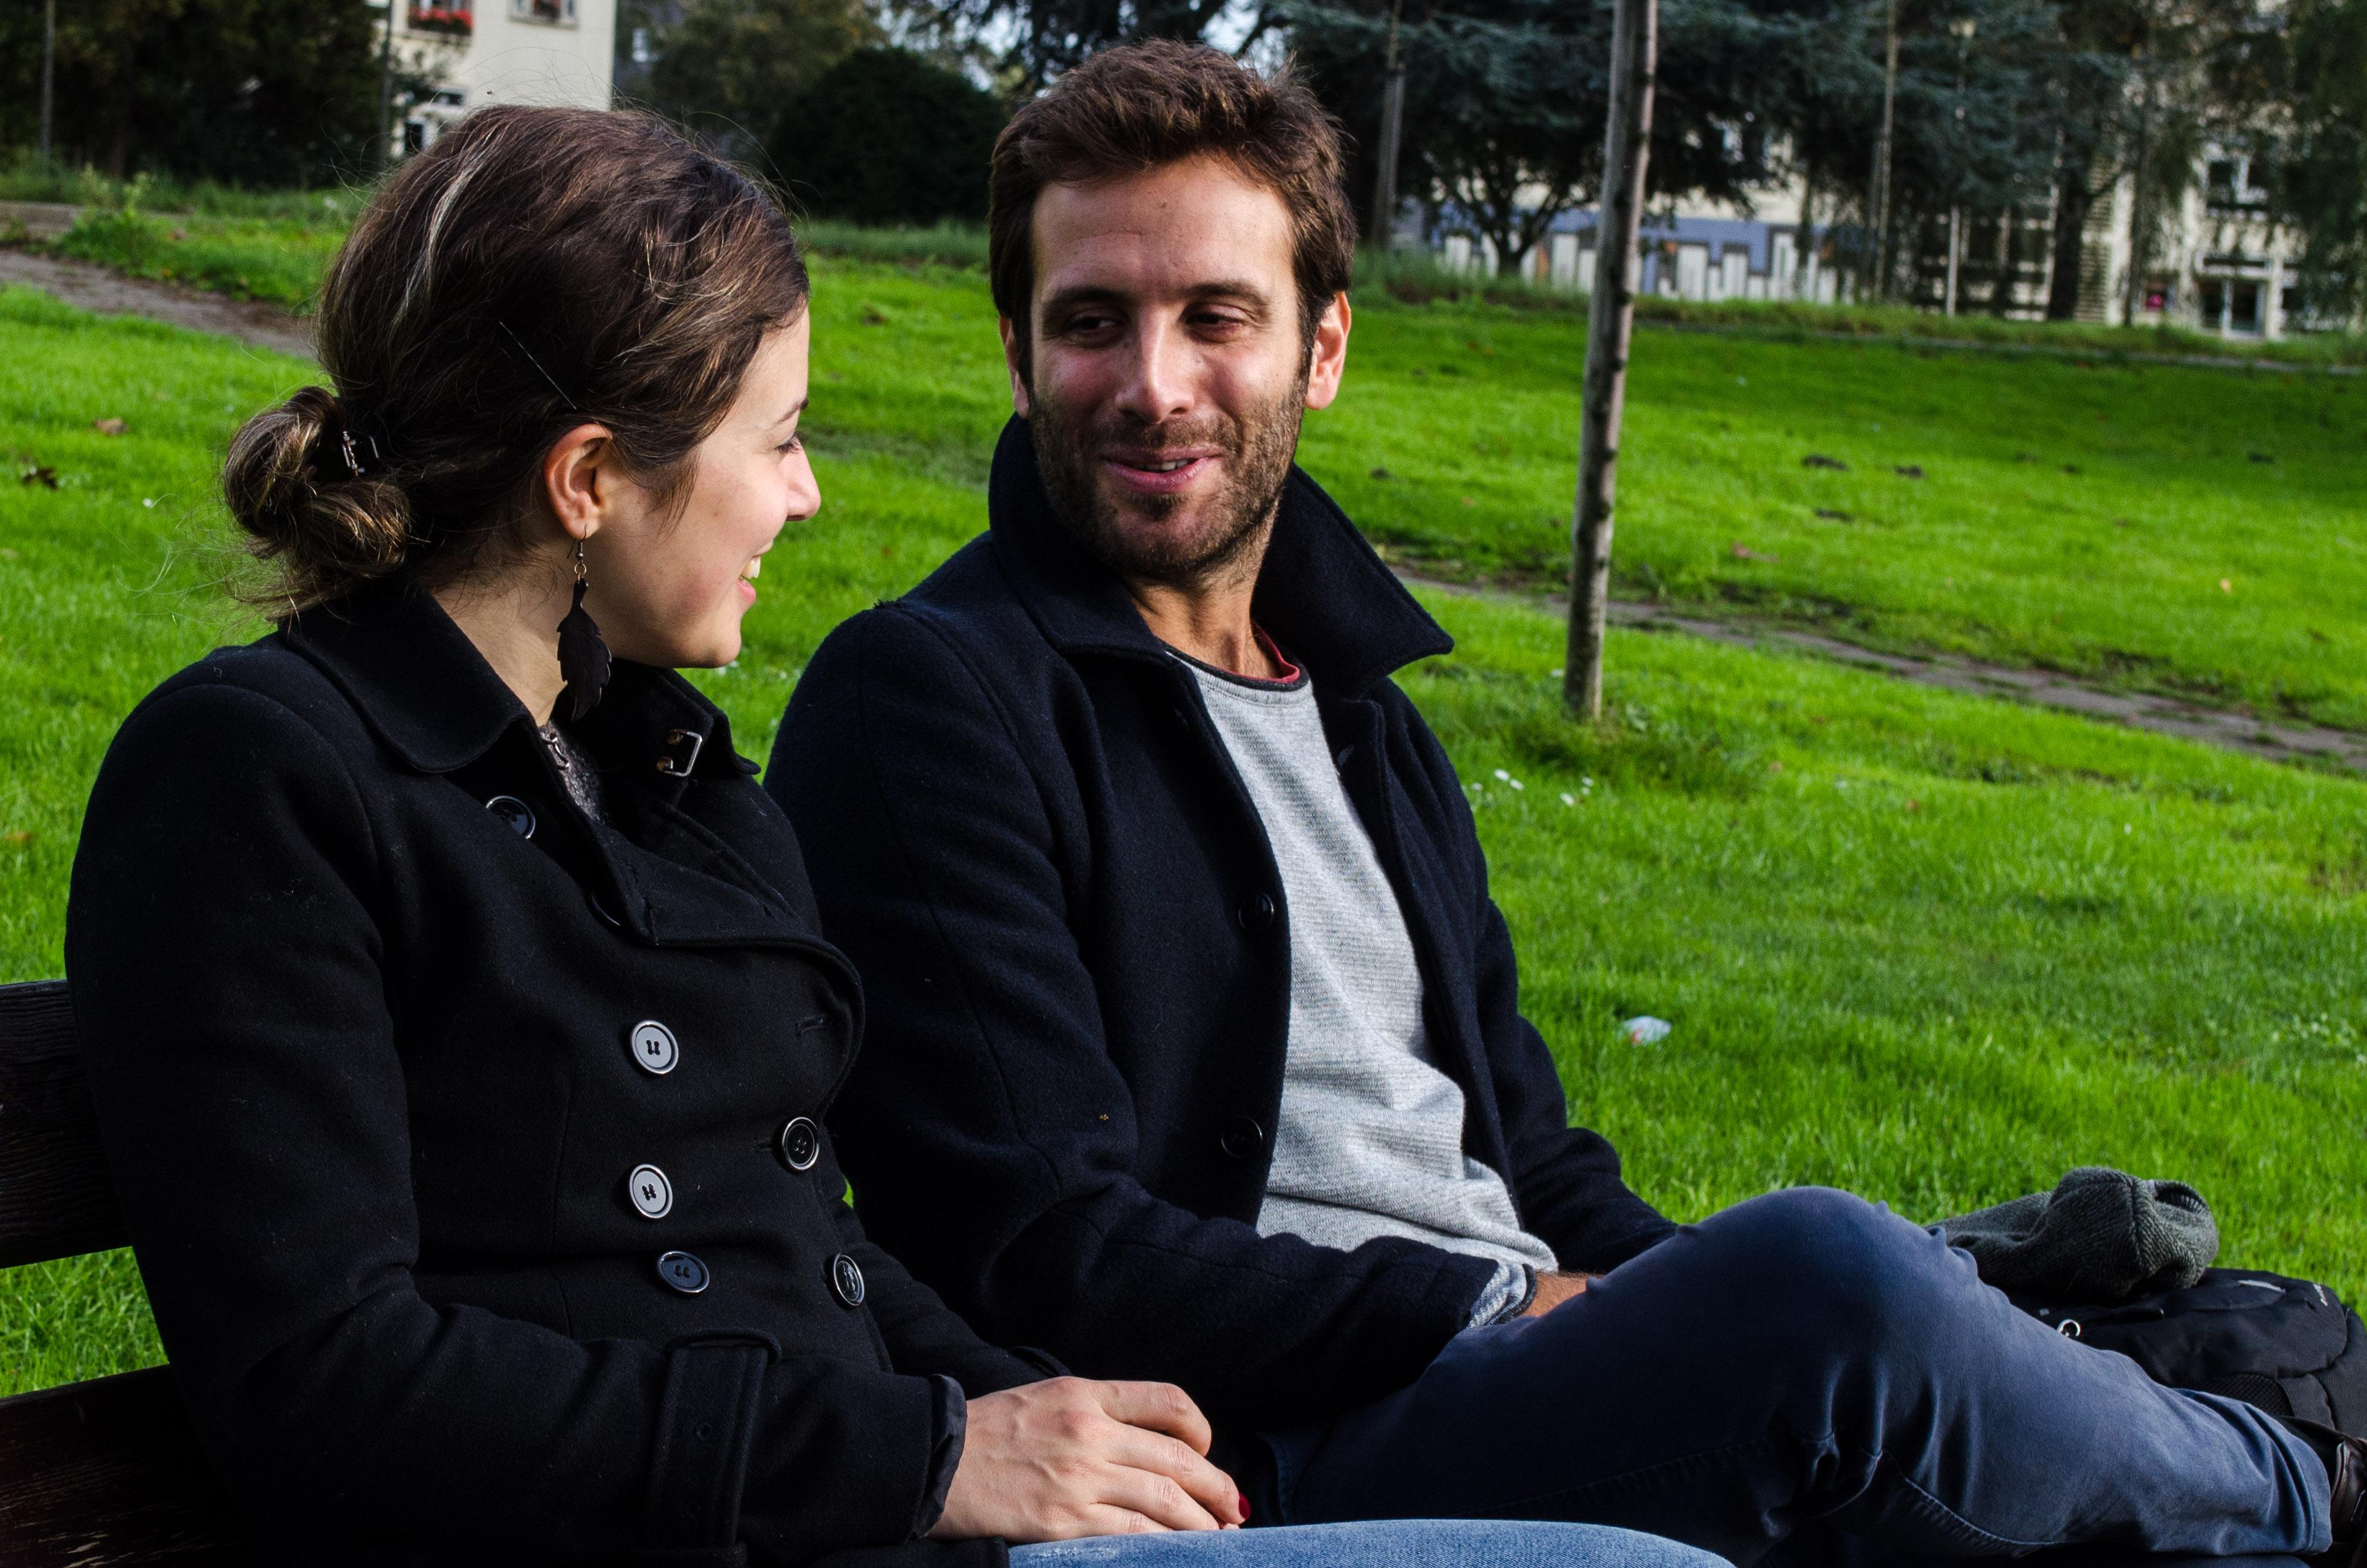 Francesco en Eda web 1.jpg